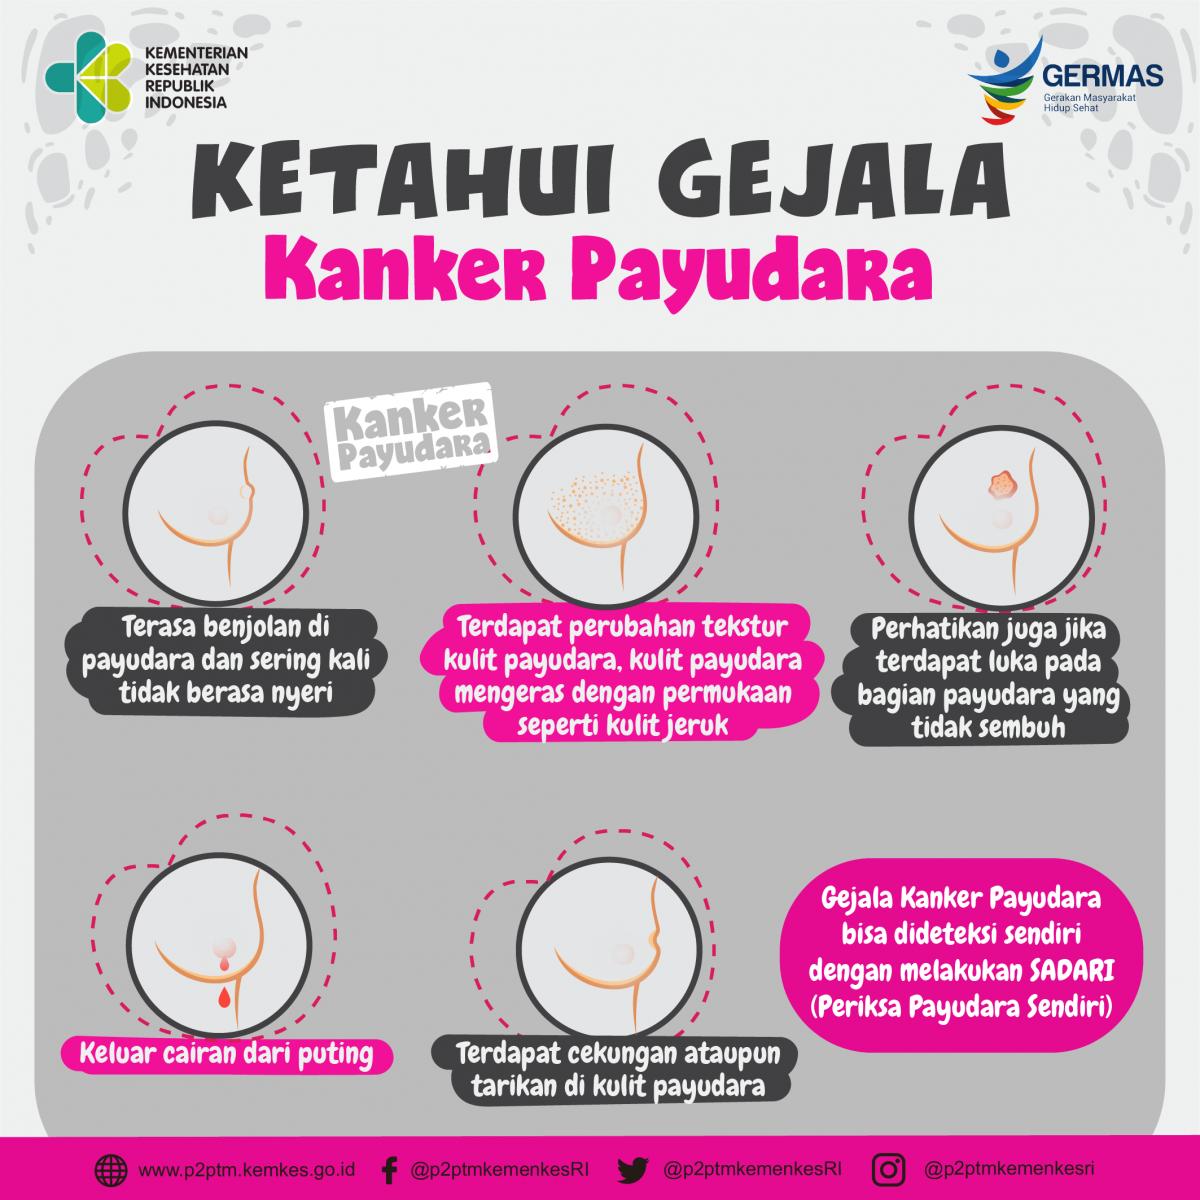 Waspada gejala kanker payudara - Direktorat P2PTM